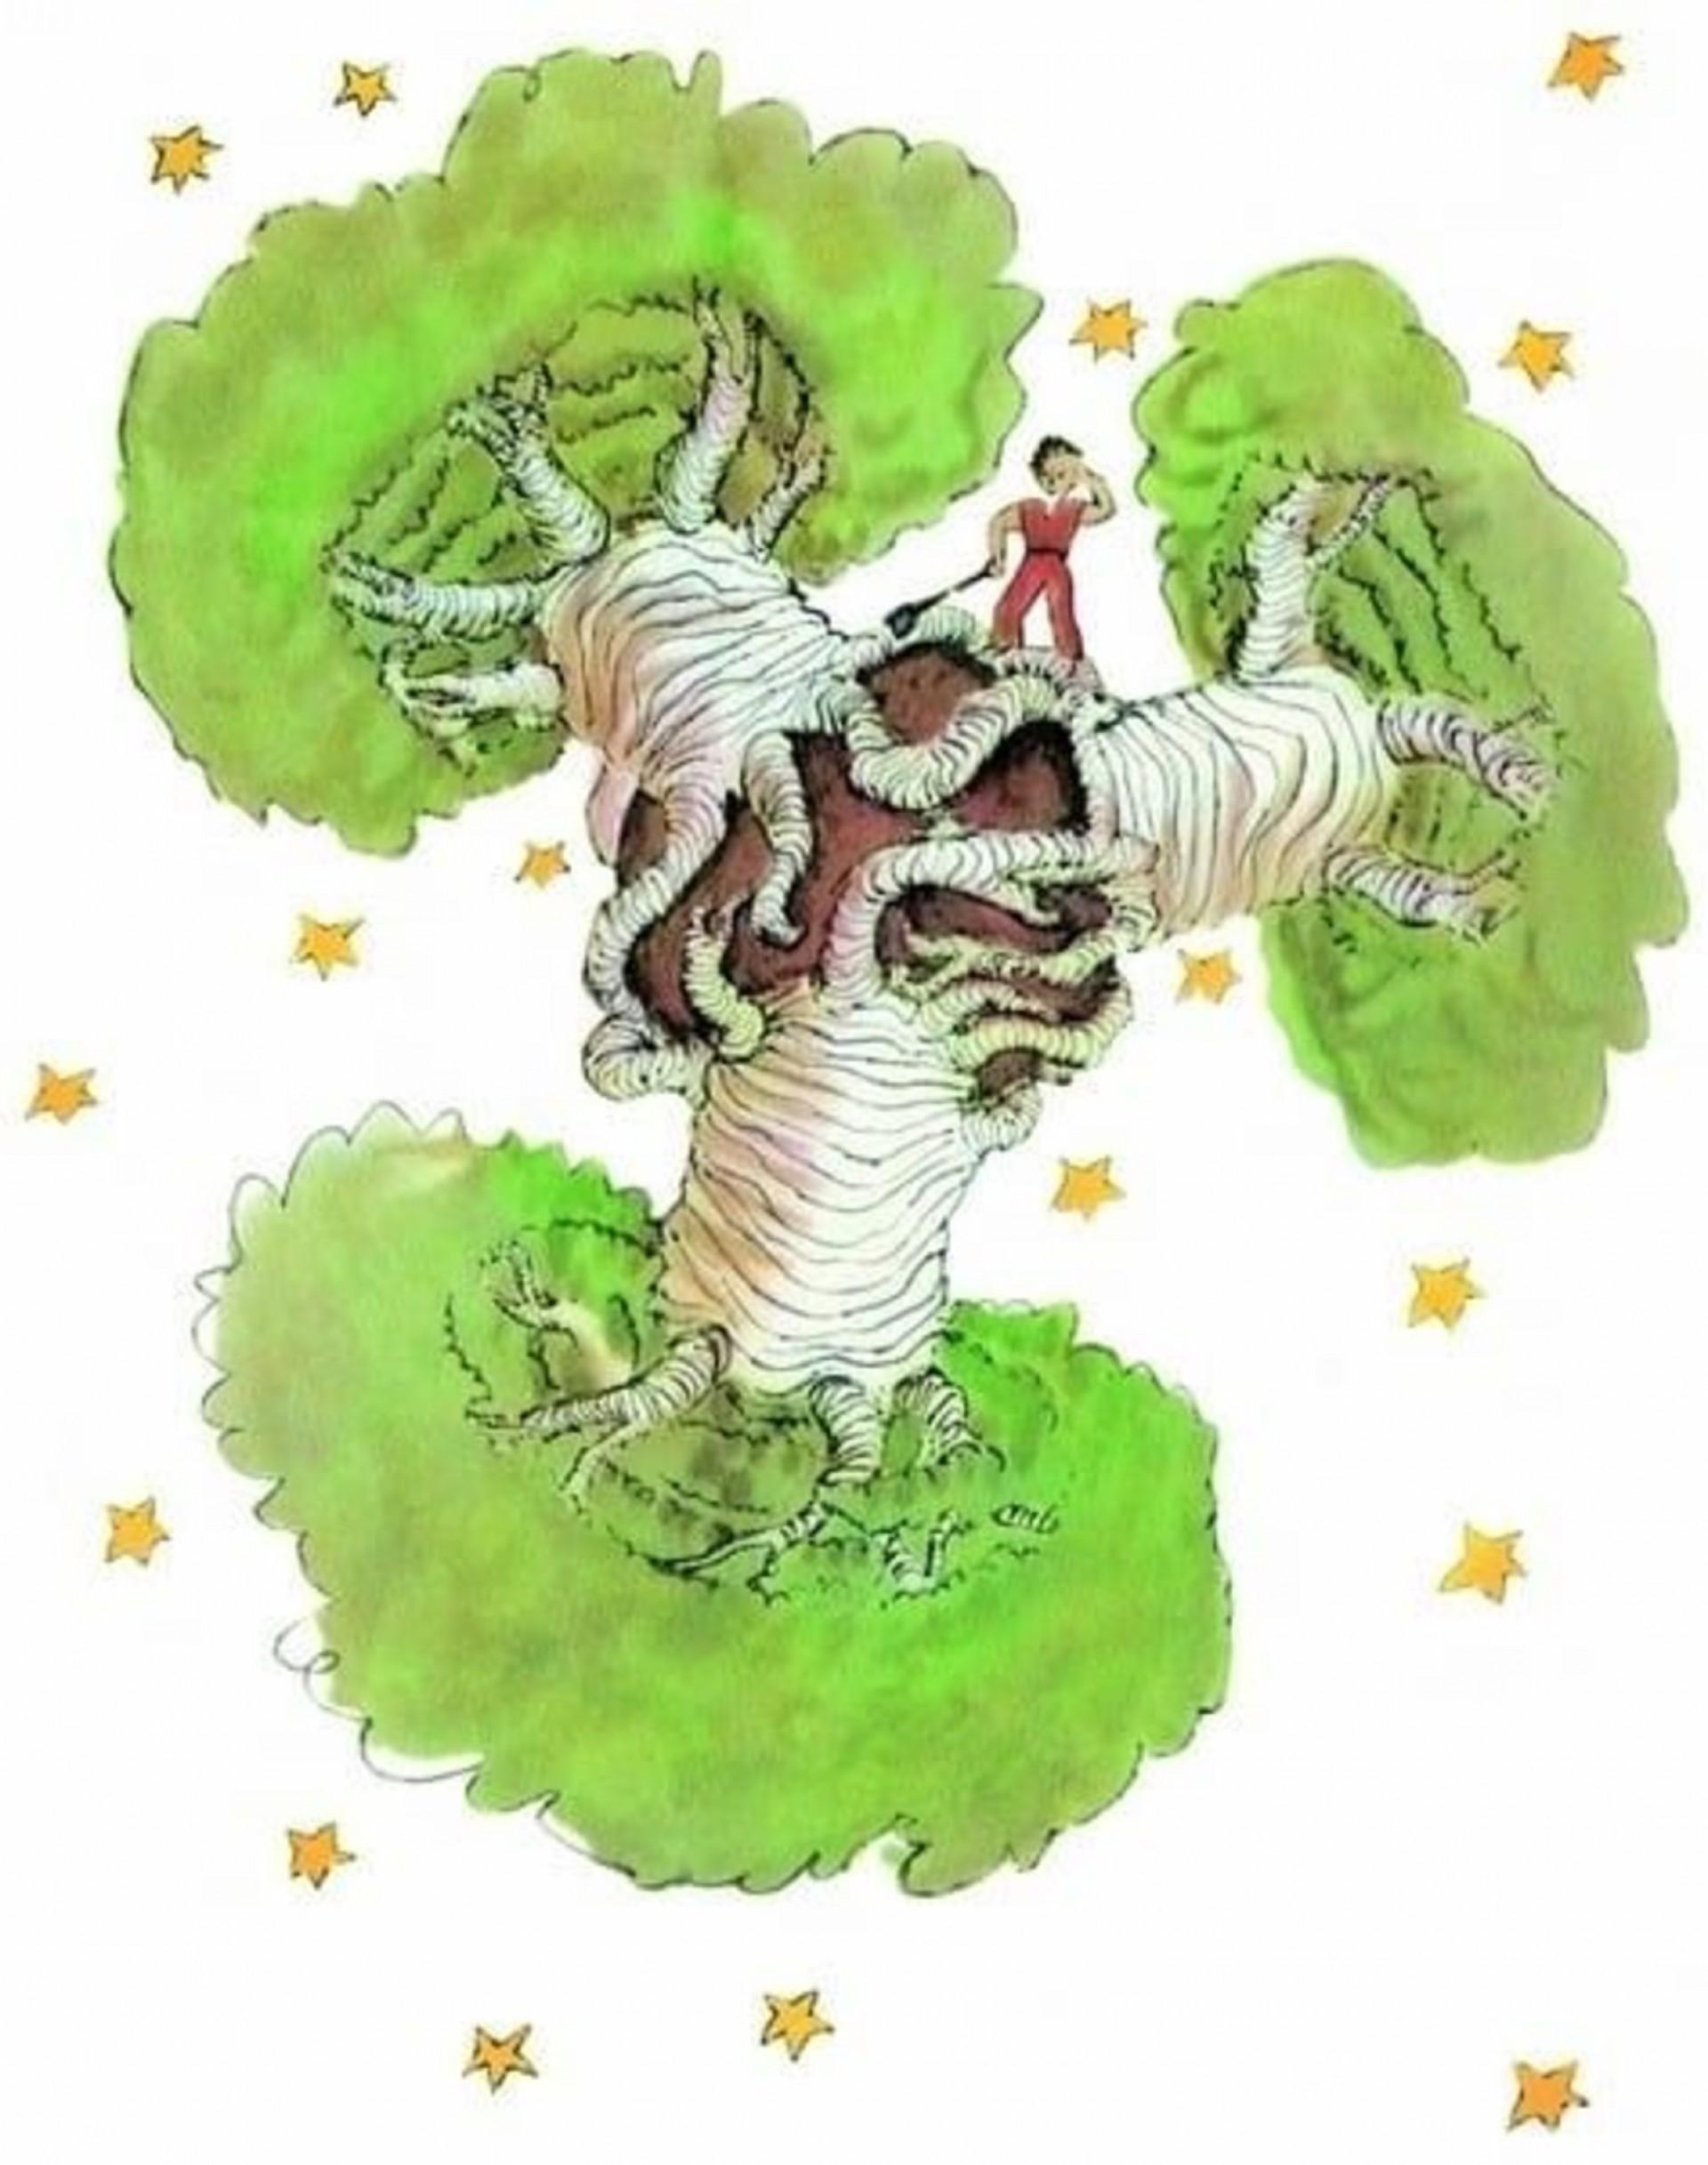 Os baobás do Pequeno Príncipe.(Foto: O Pequeno Príncipe, de  Antoine de Saint-Exupéry)